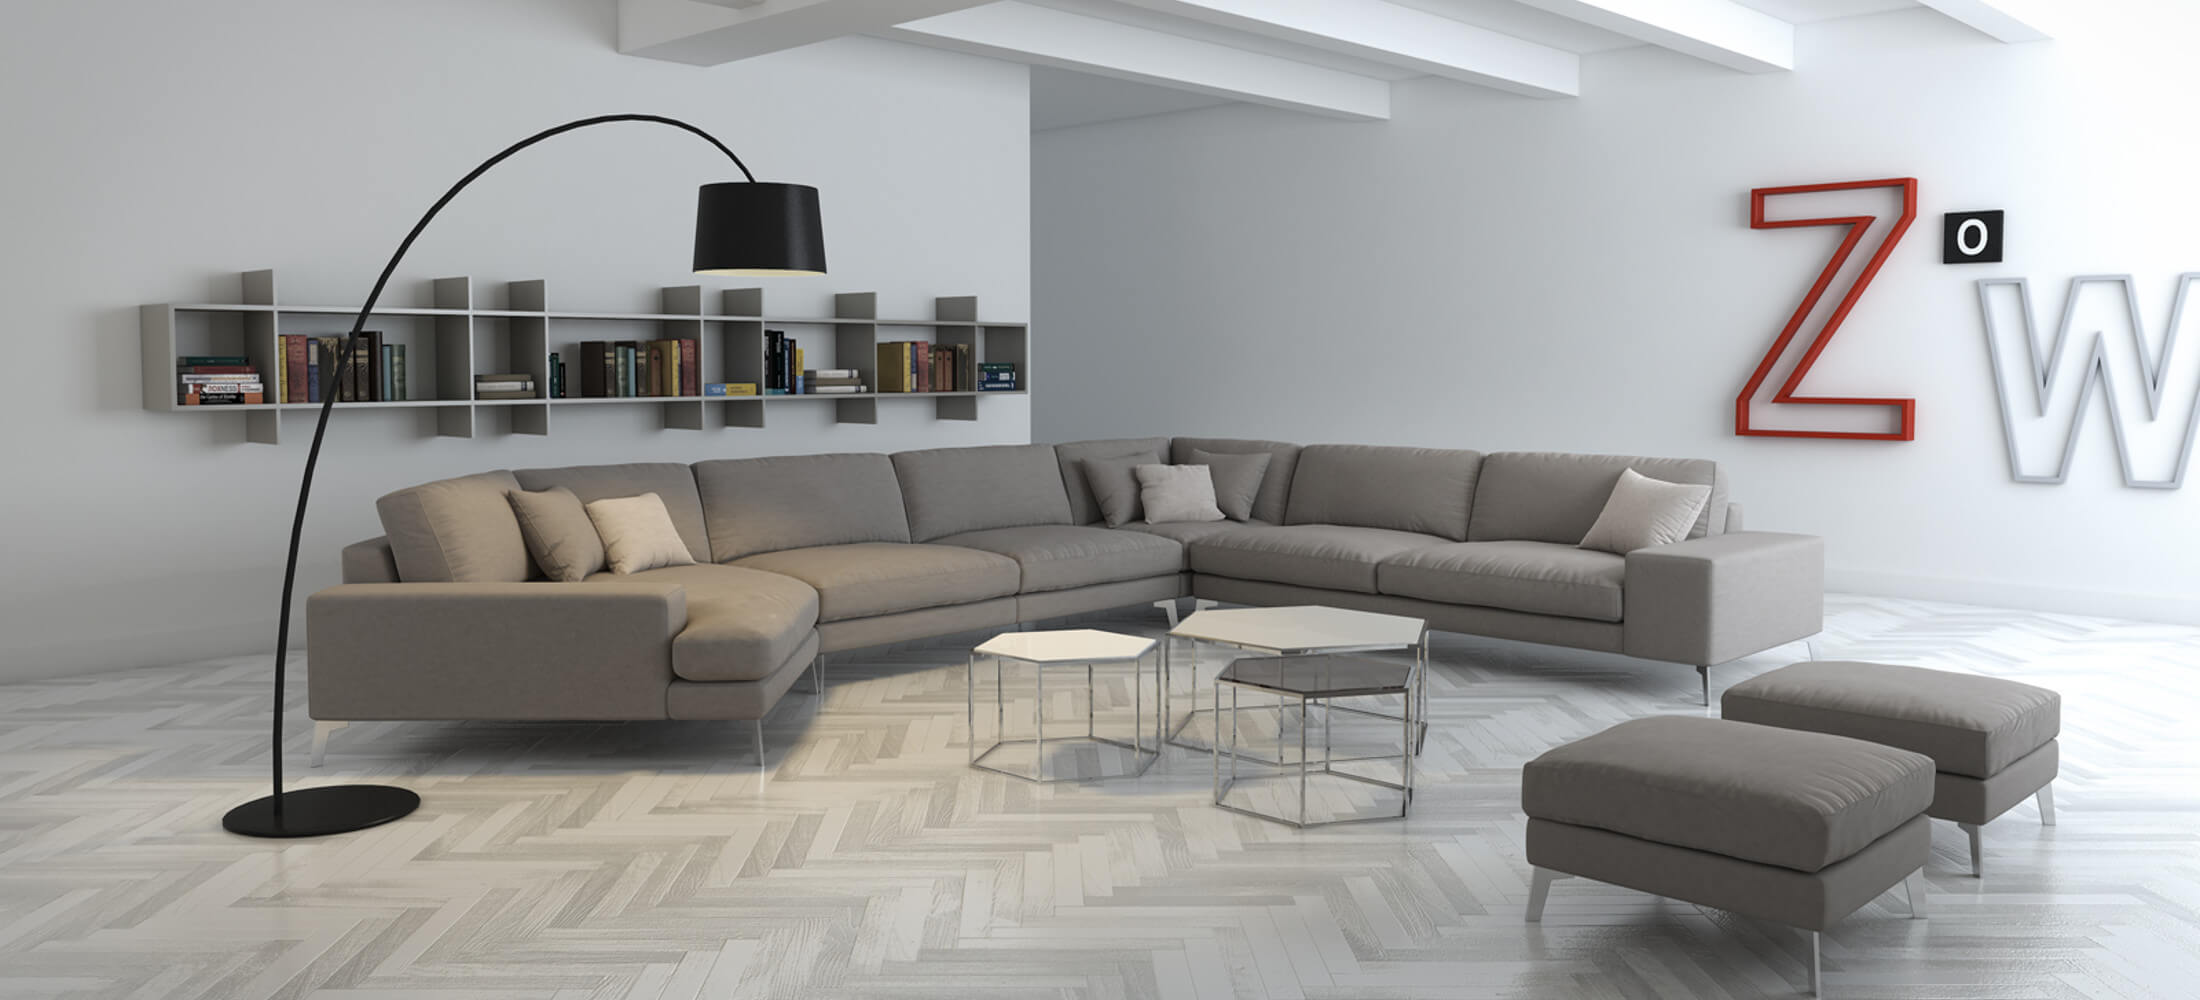 Ambiente sofá Zow rinconera